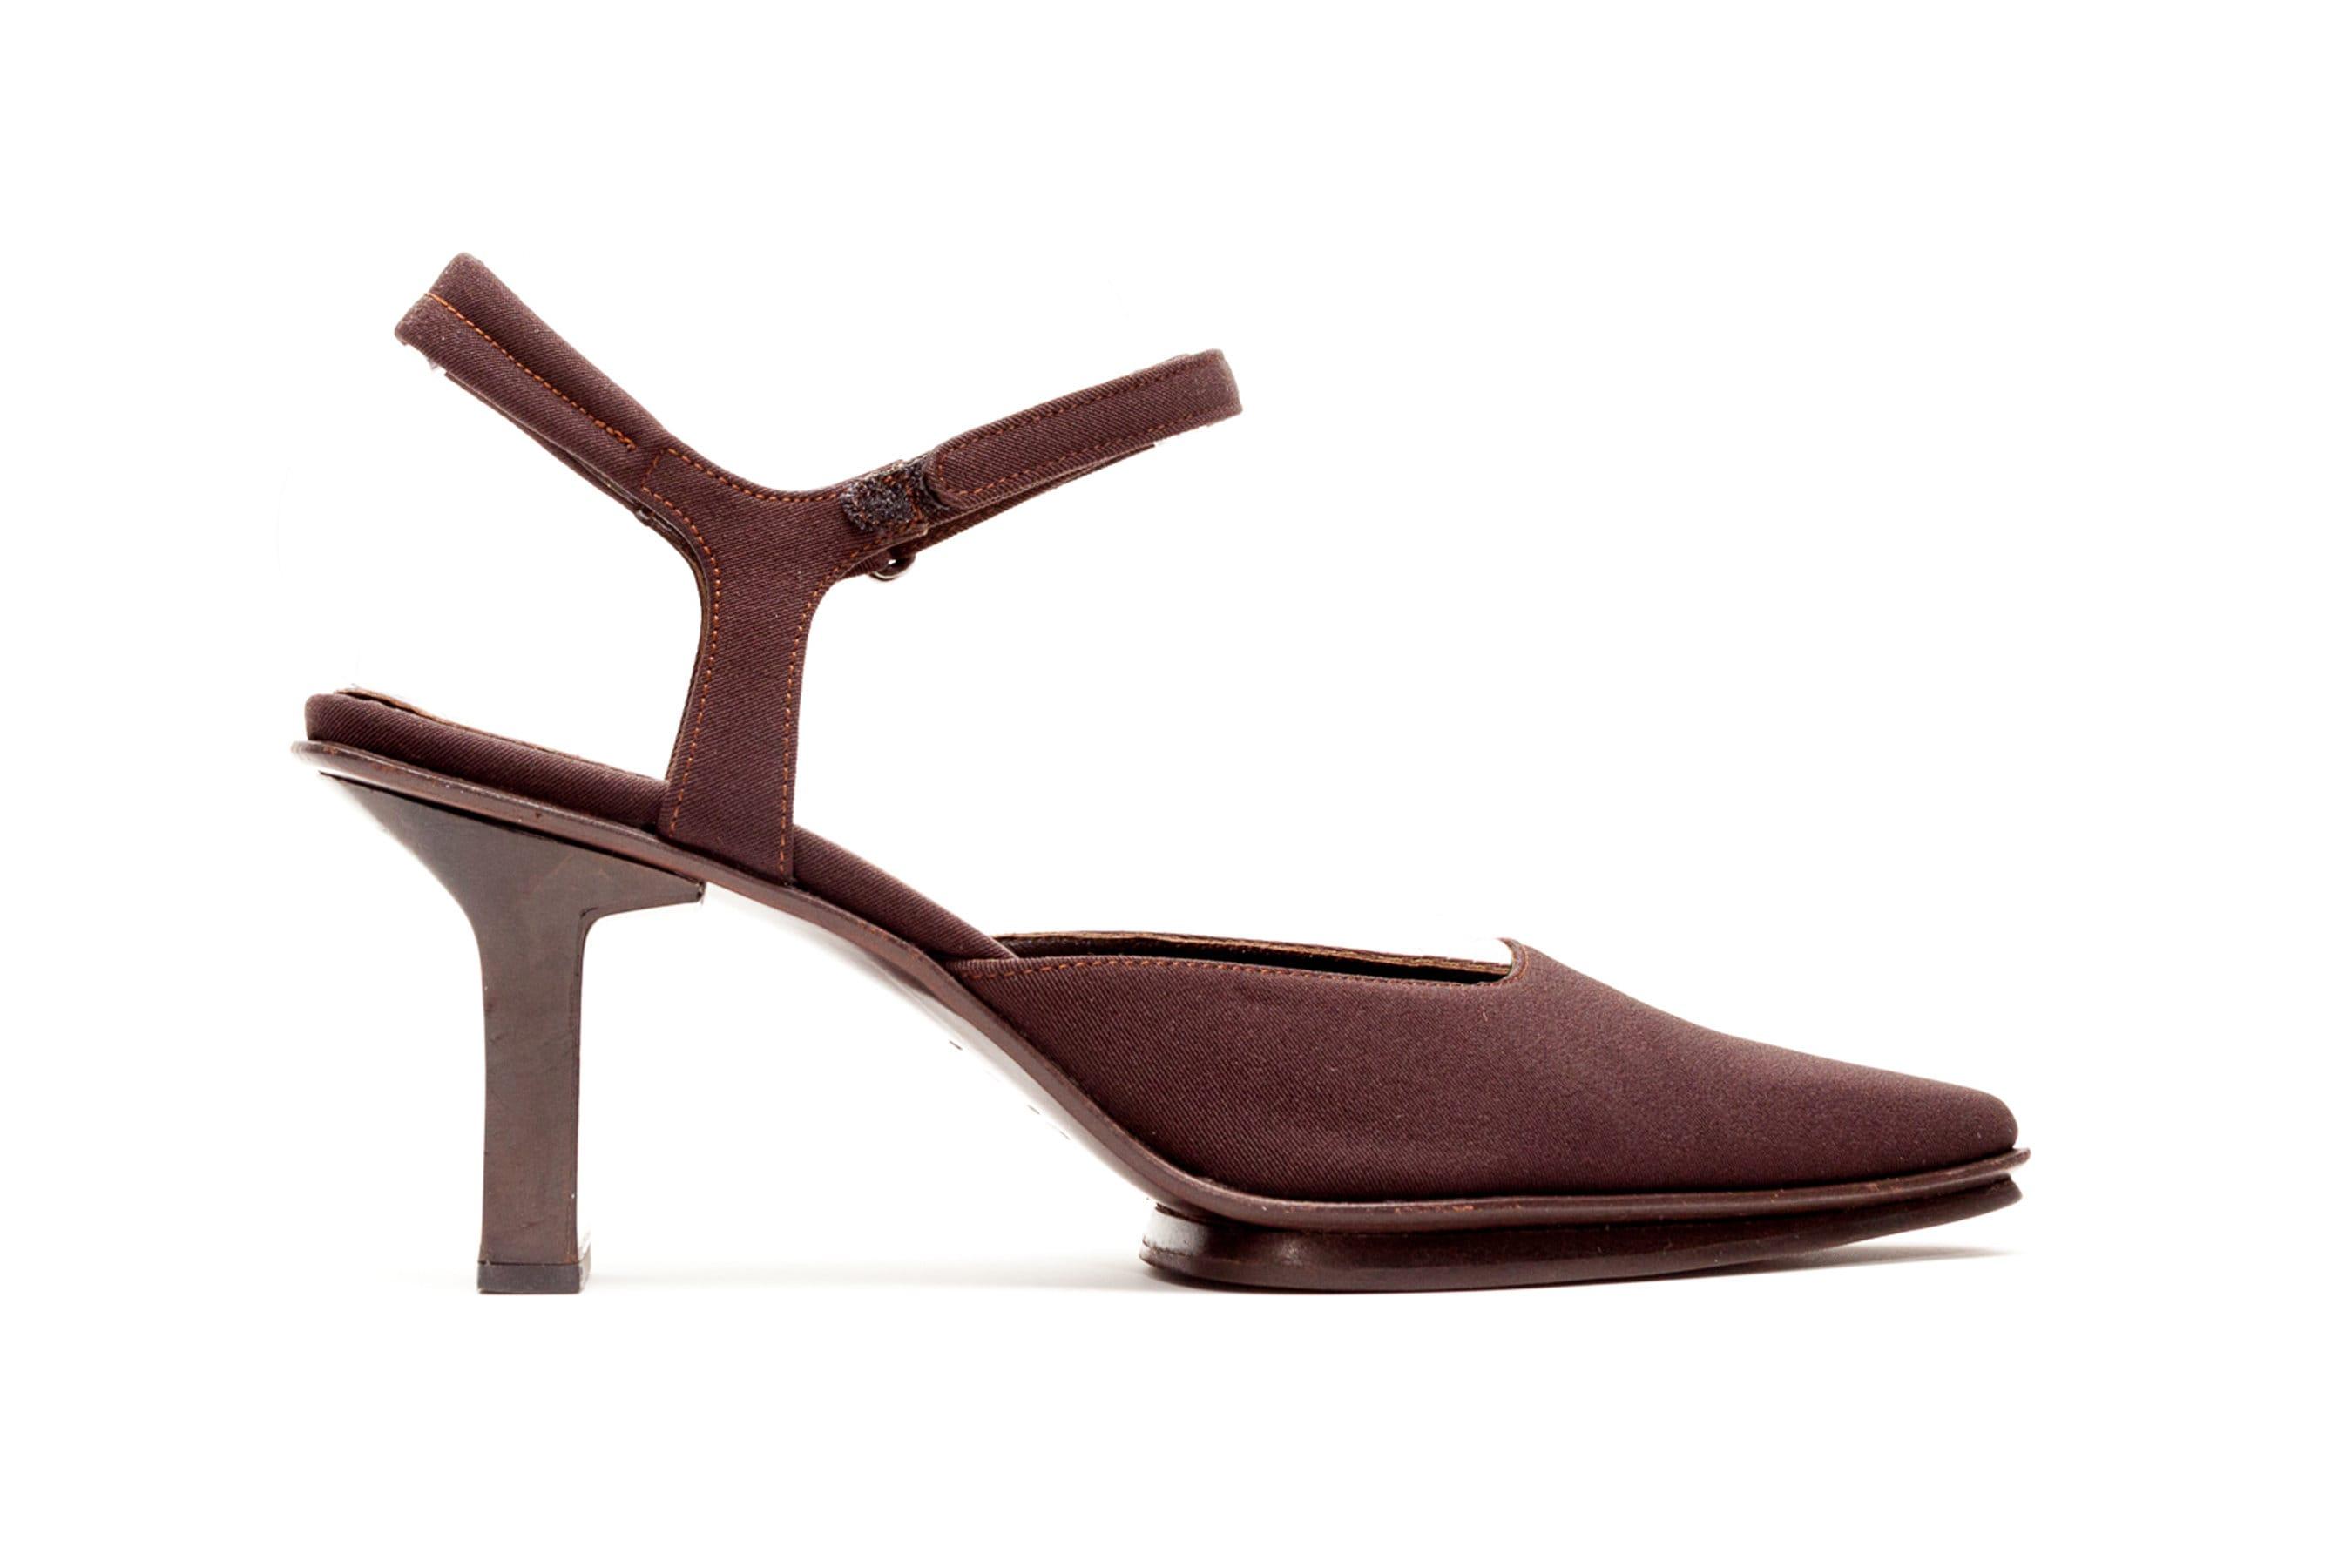 92957cb14 Prada Vintage Shoes Platform High Heels in Dark Brown Silk